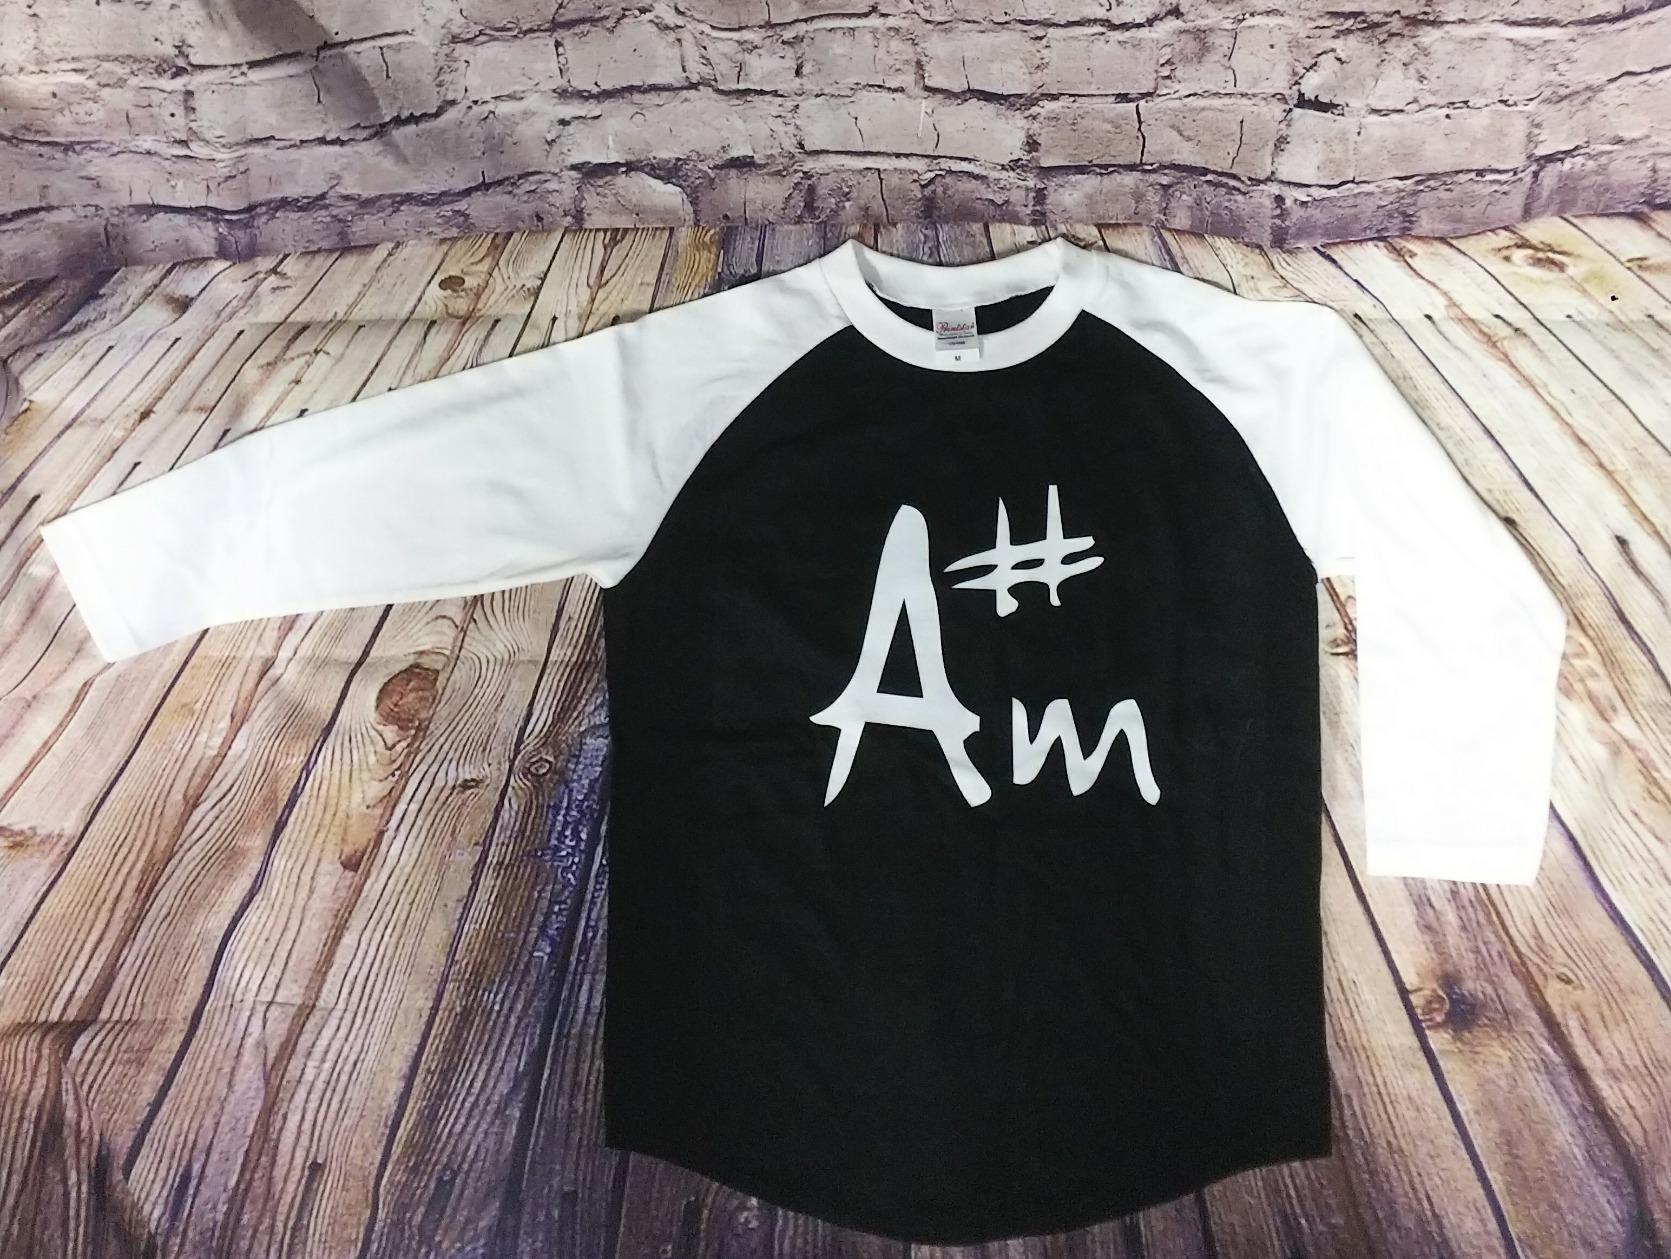 A♯m ラグランシャツ(白袖)